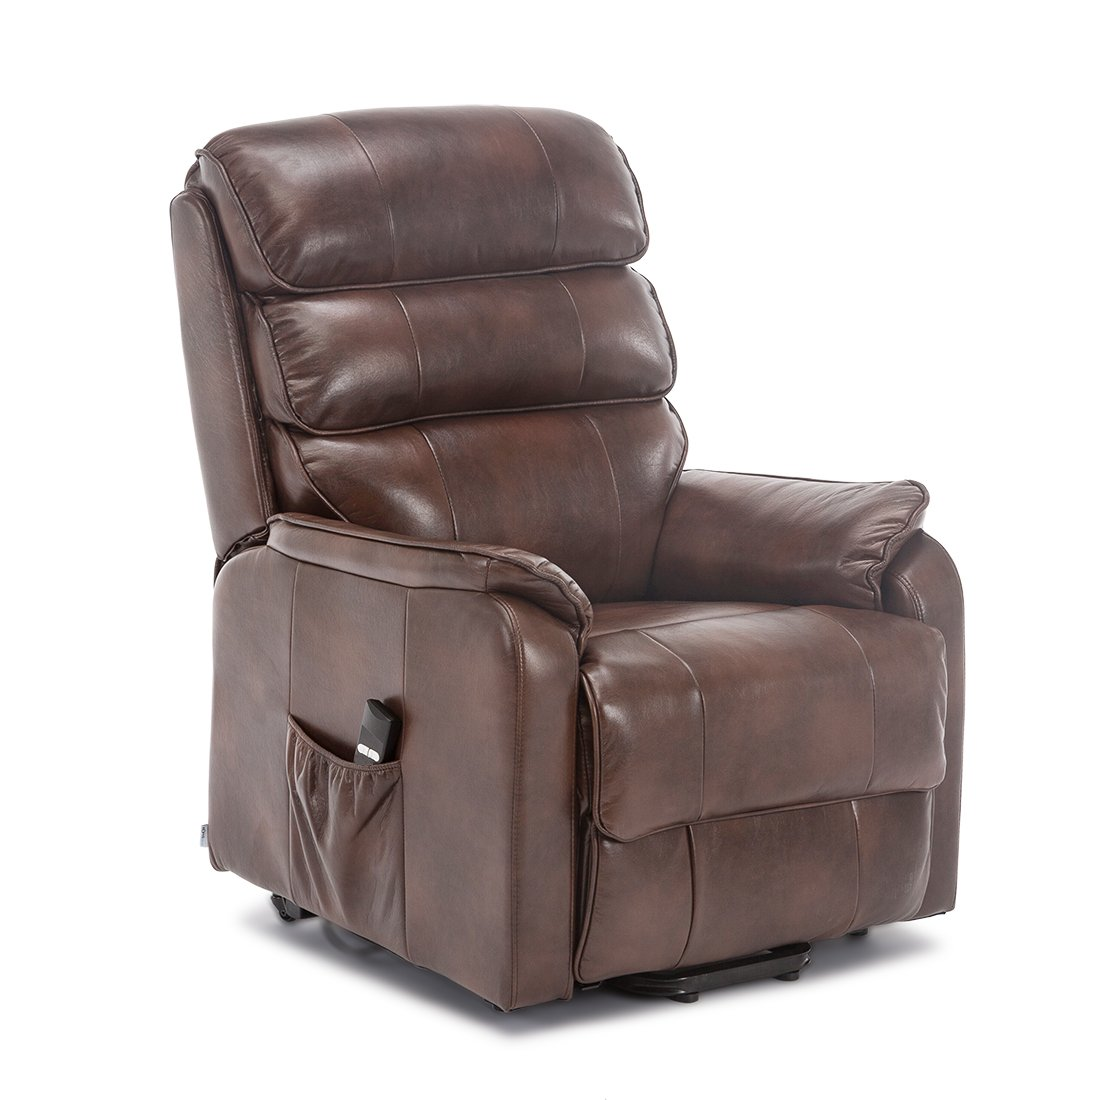 Pleasing More4Homes Buckingham Elecrtic Rise Recliner Leather Air Riser Sofa Armchair Lounge Chair Brown Creativecarmelina Interior Chair Design Creativecarmelinacom